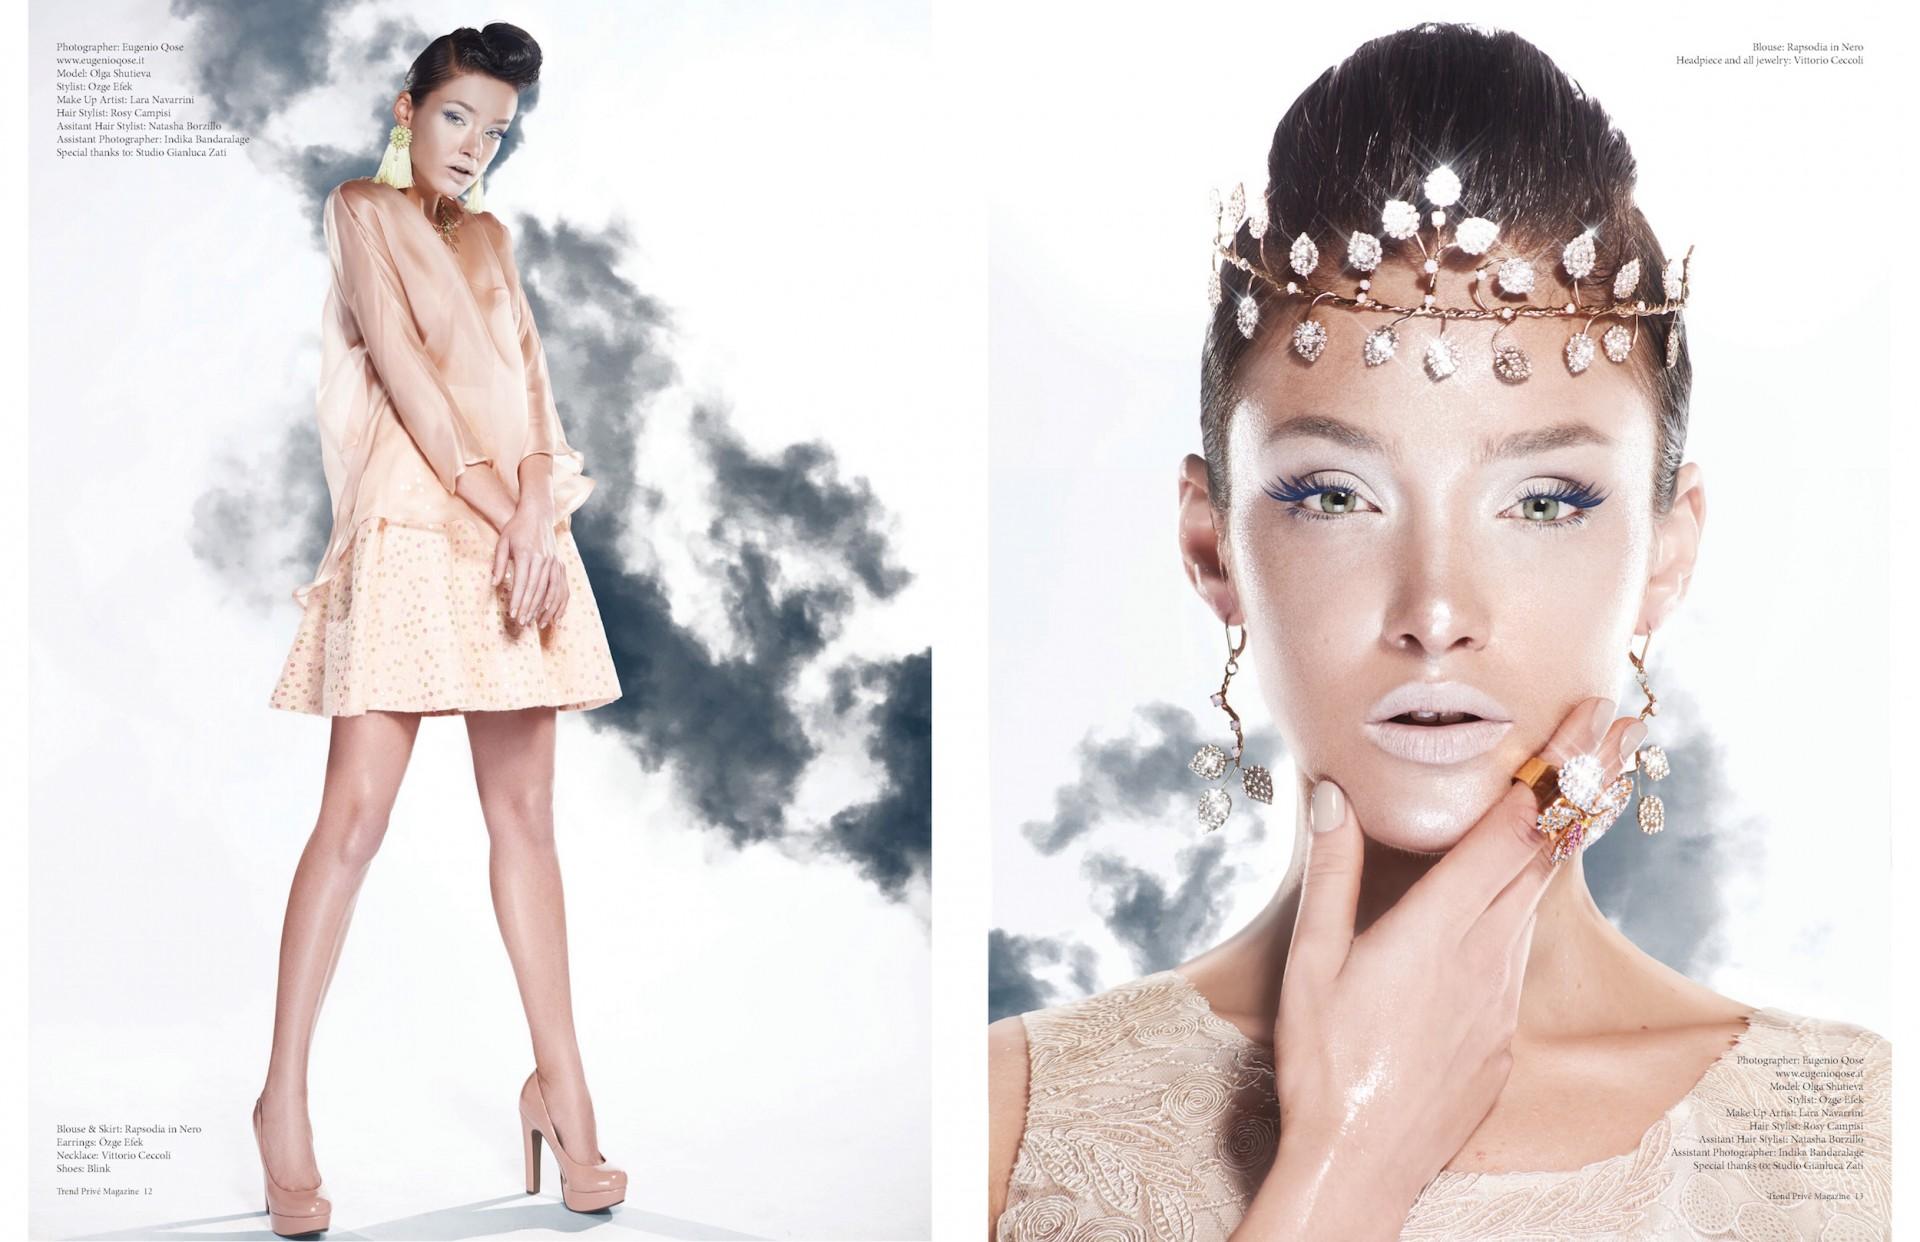 Trend_prive_magazine_eugenio_qose_olga_shutieva_04